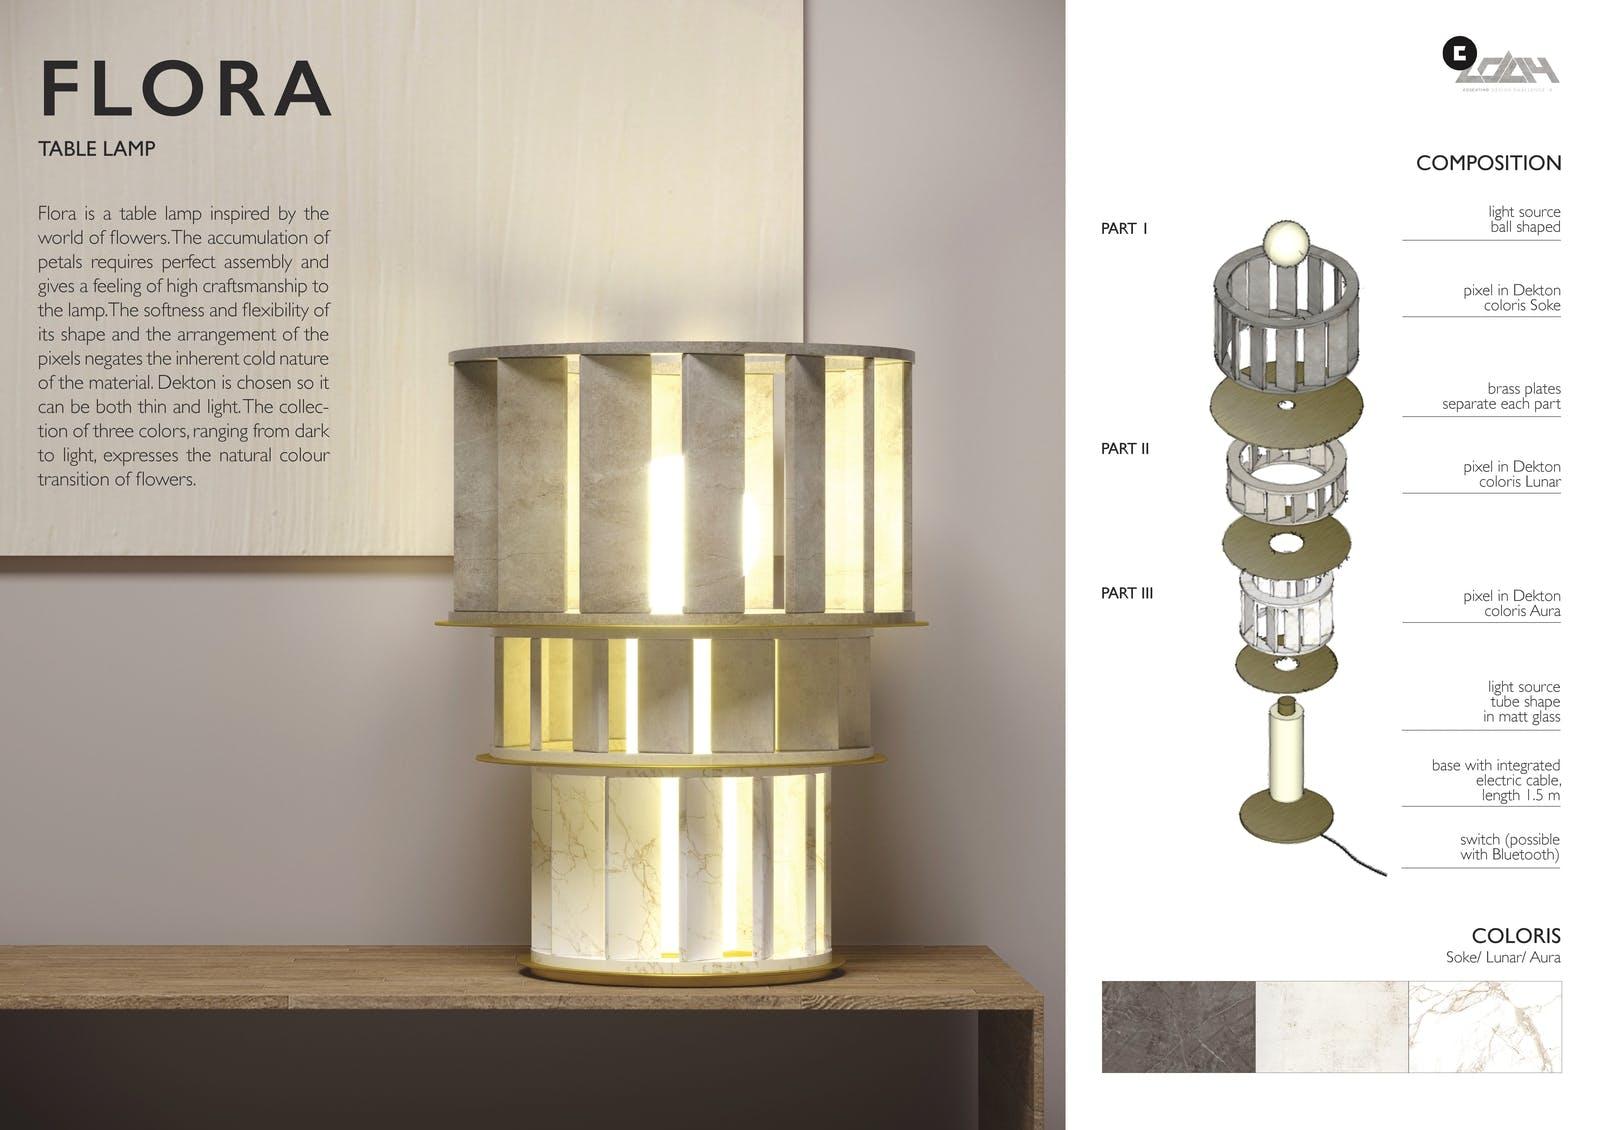 Image of 071 FLORA s 1 in Ganadores Cosentino Design Challenge 14 - Cosentino